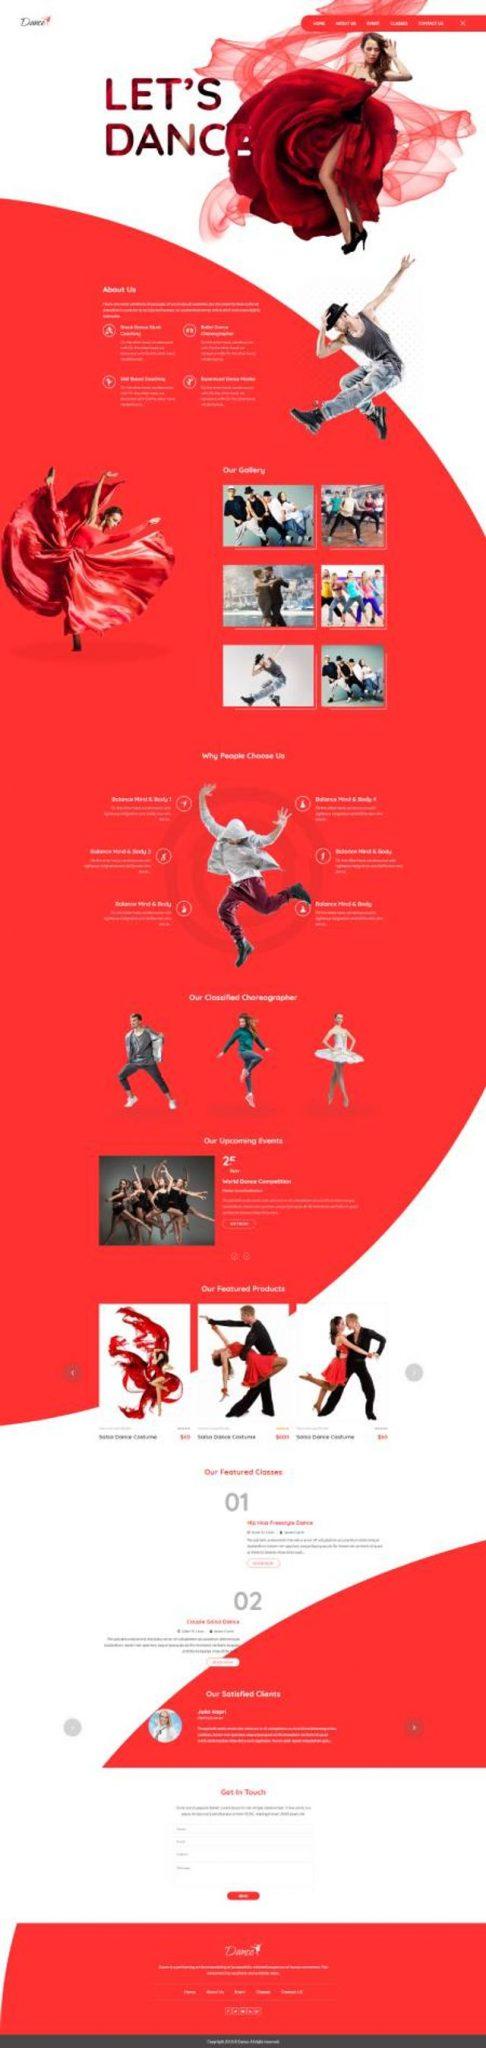 GD0723 – Mẫu Website Dạy Nhảy Dancing Academy